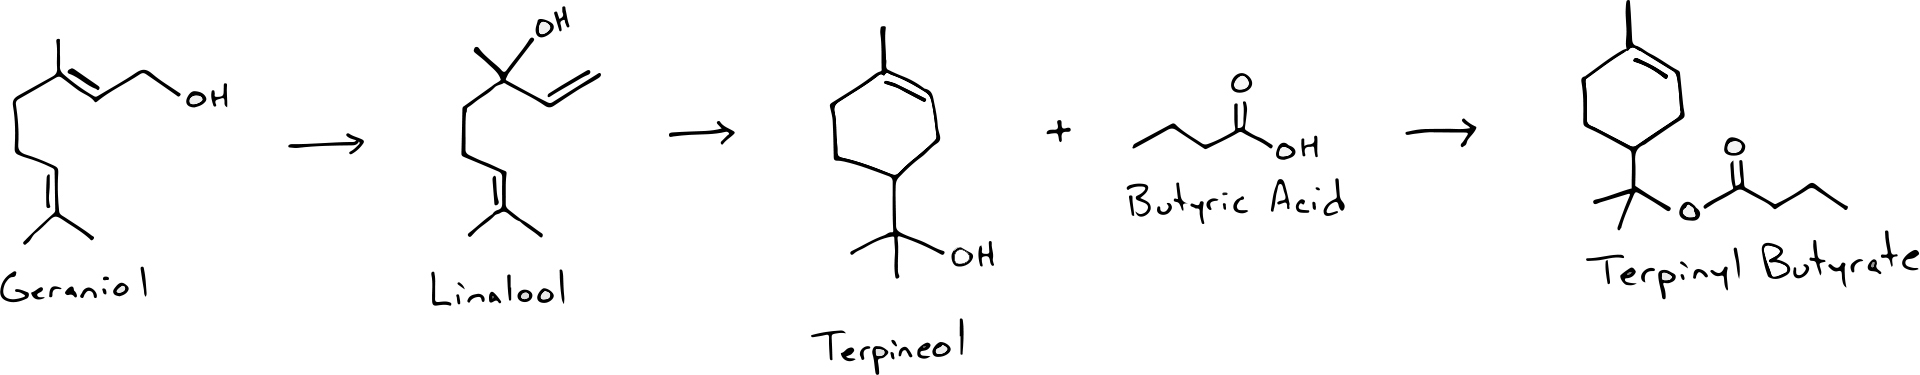 Terpinyl Butyrate